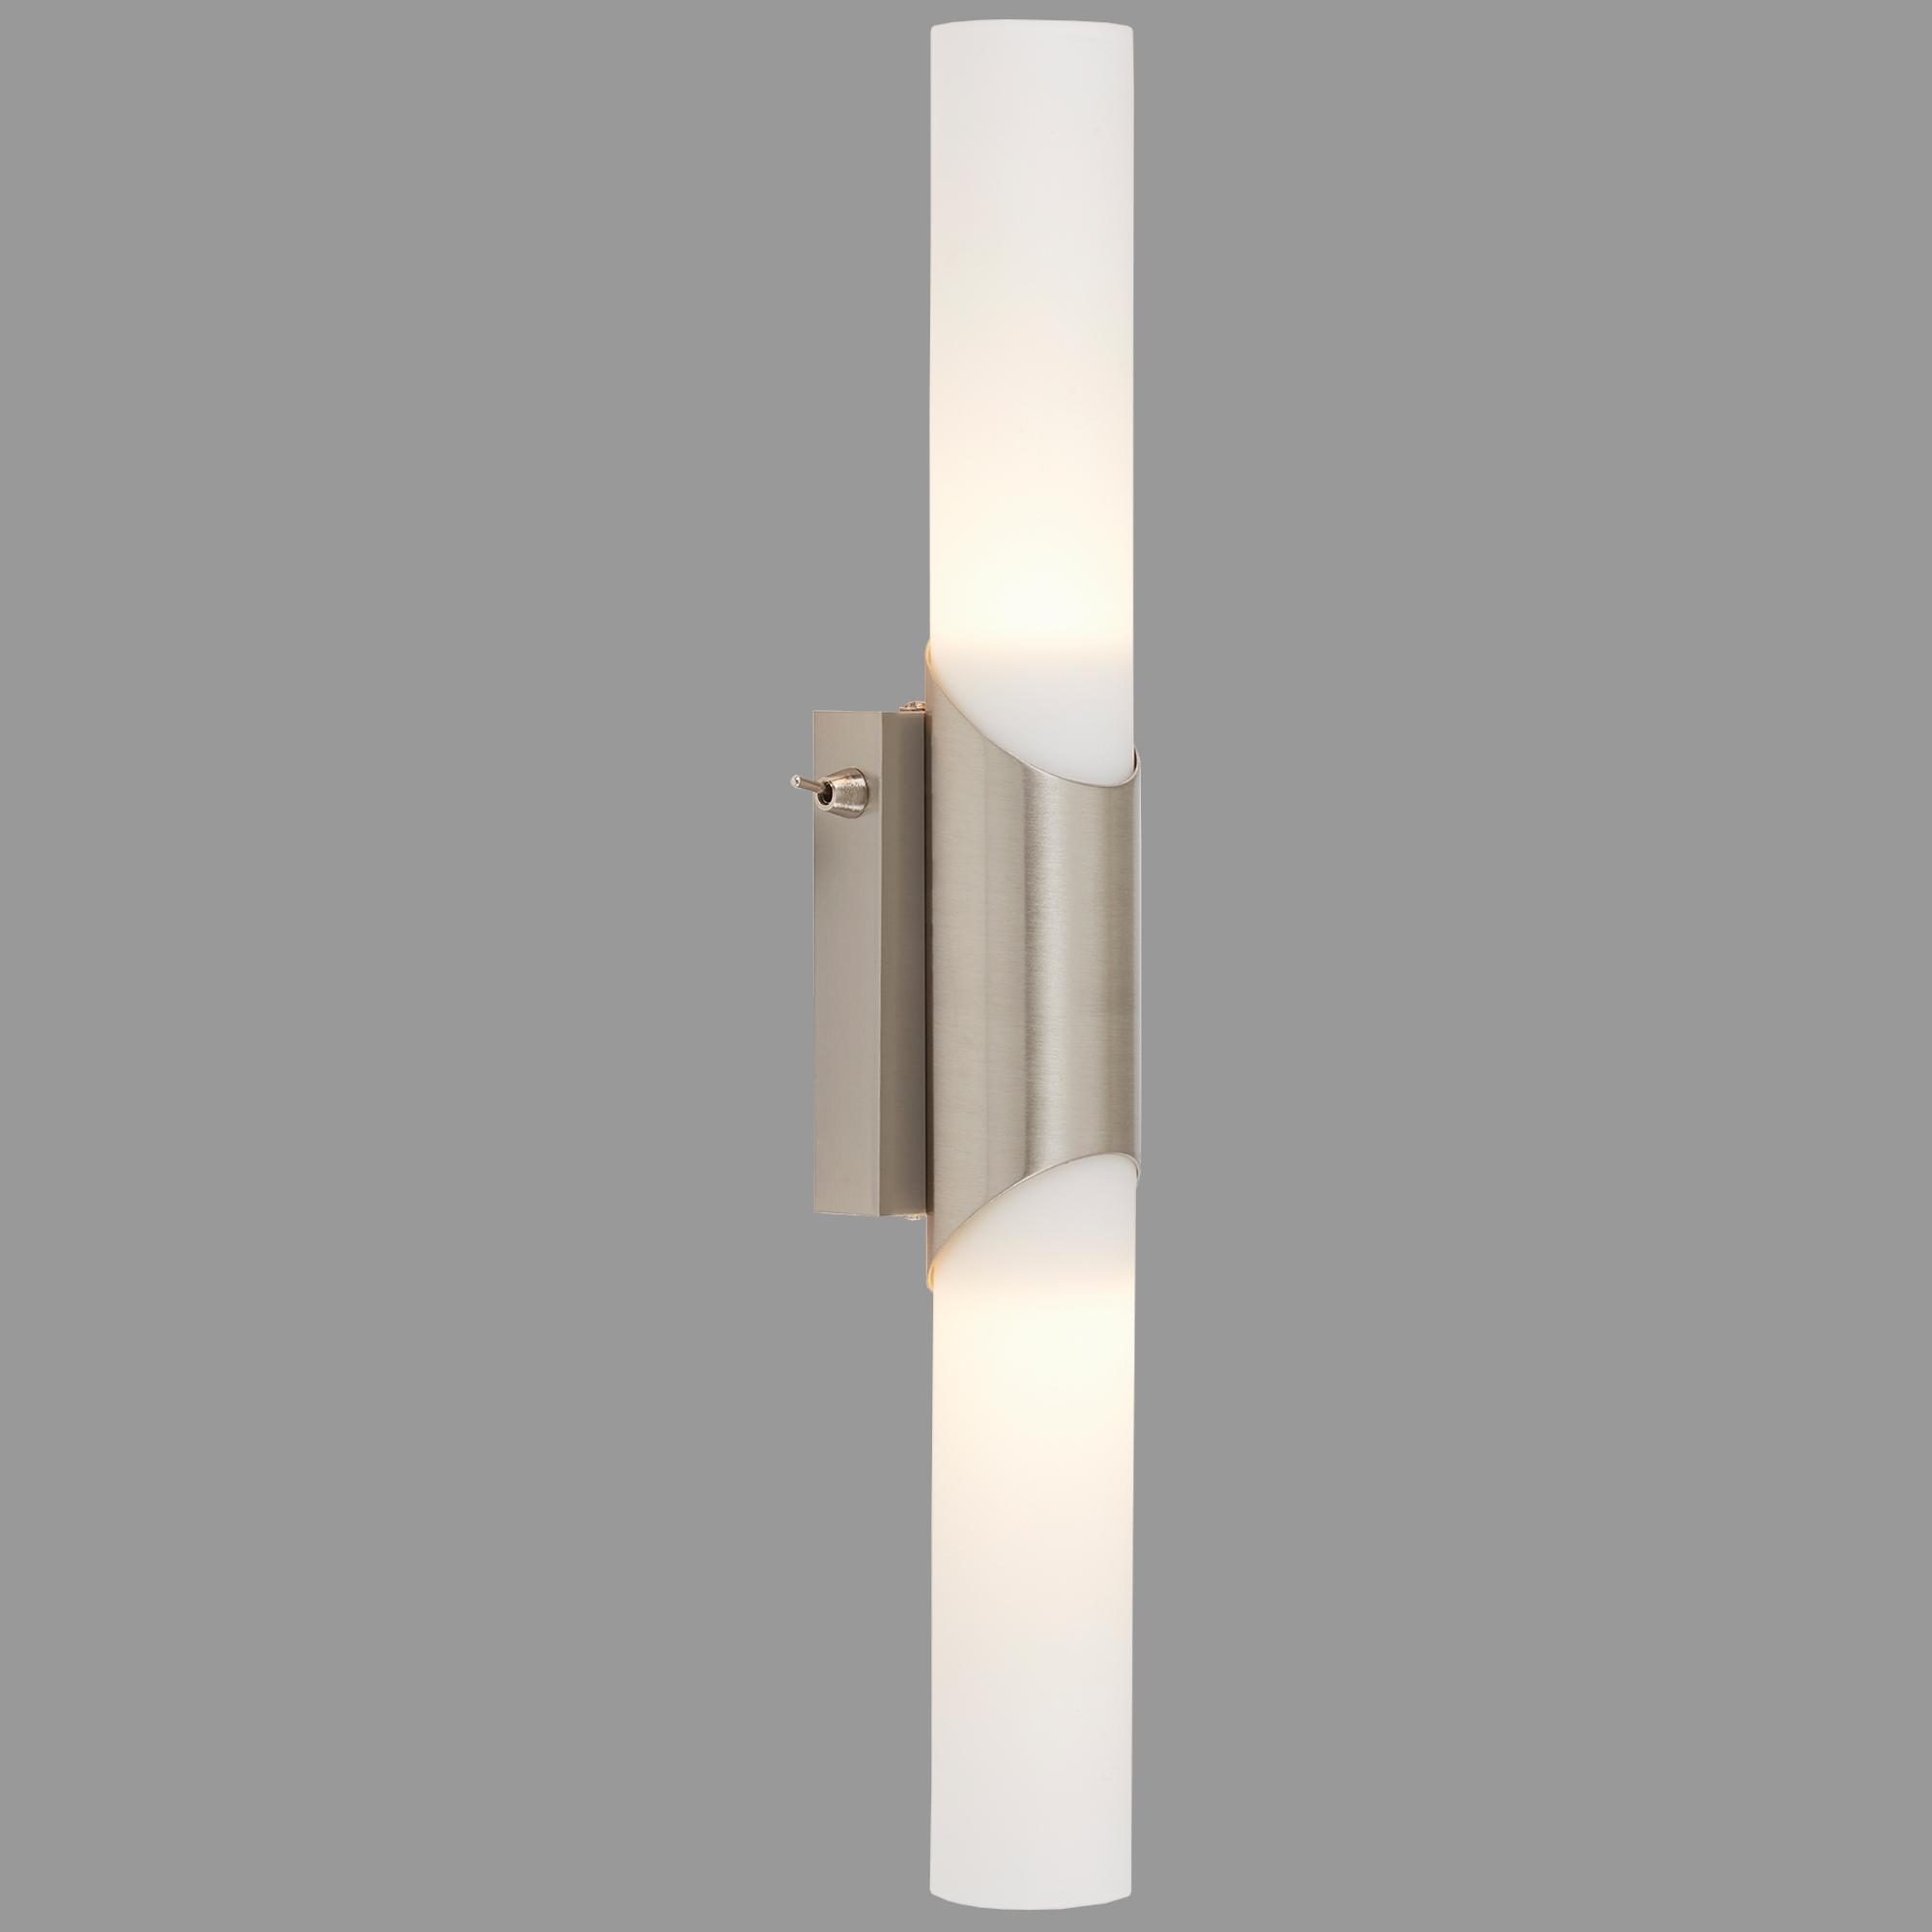 LED Wandleuchte, 43,5 cm, max. 40 W, Matt-Nickel